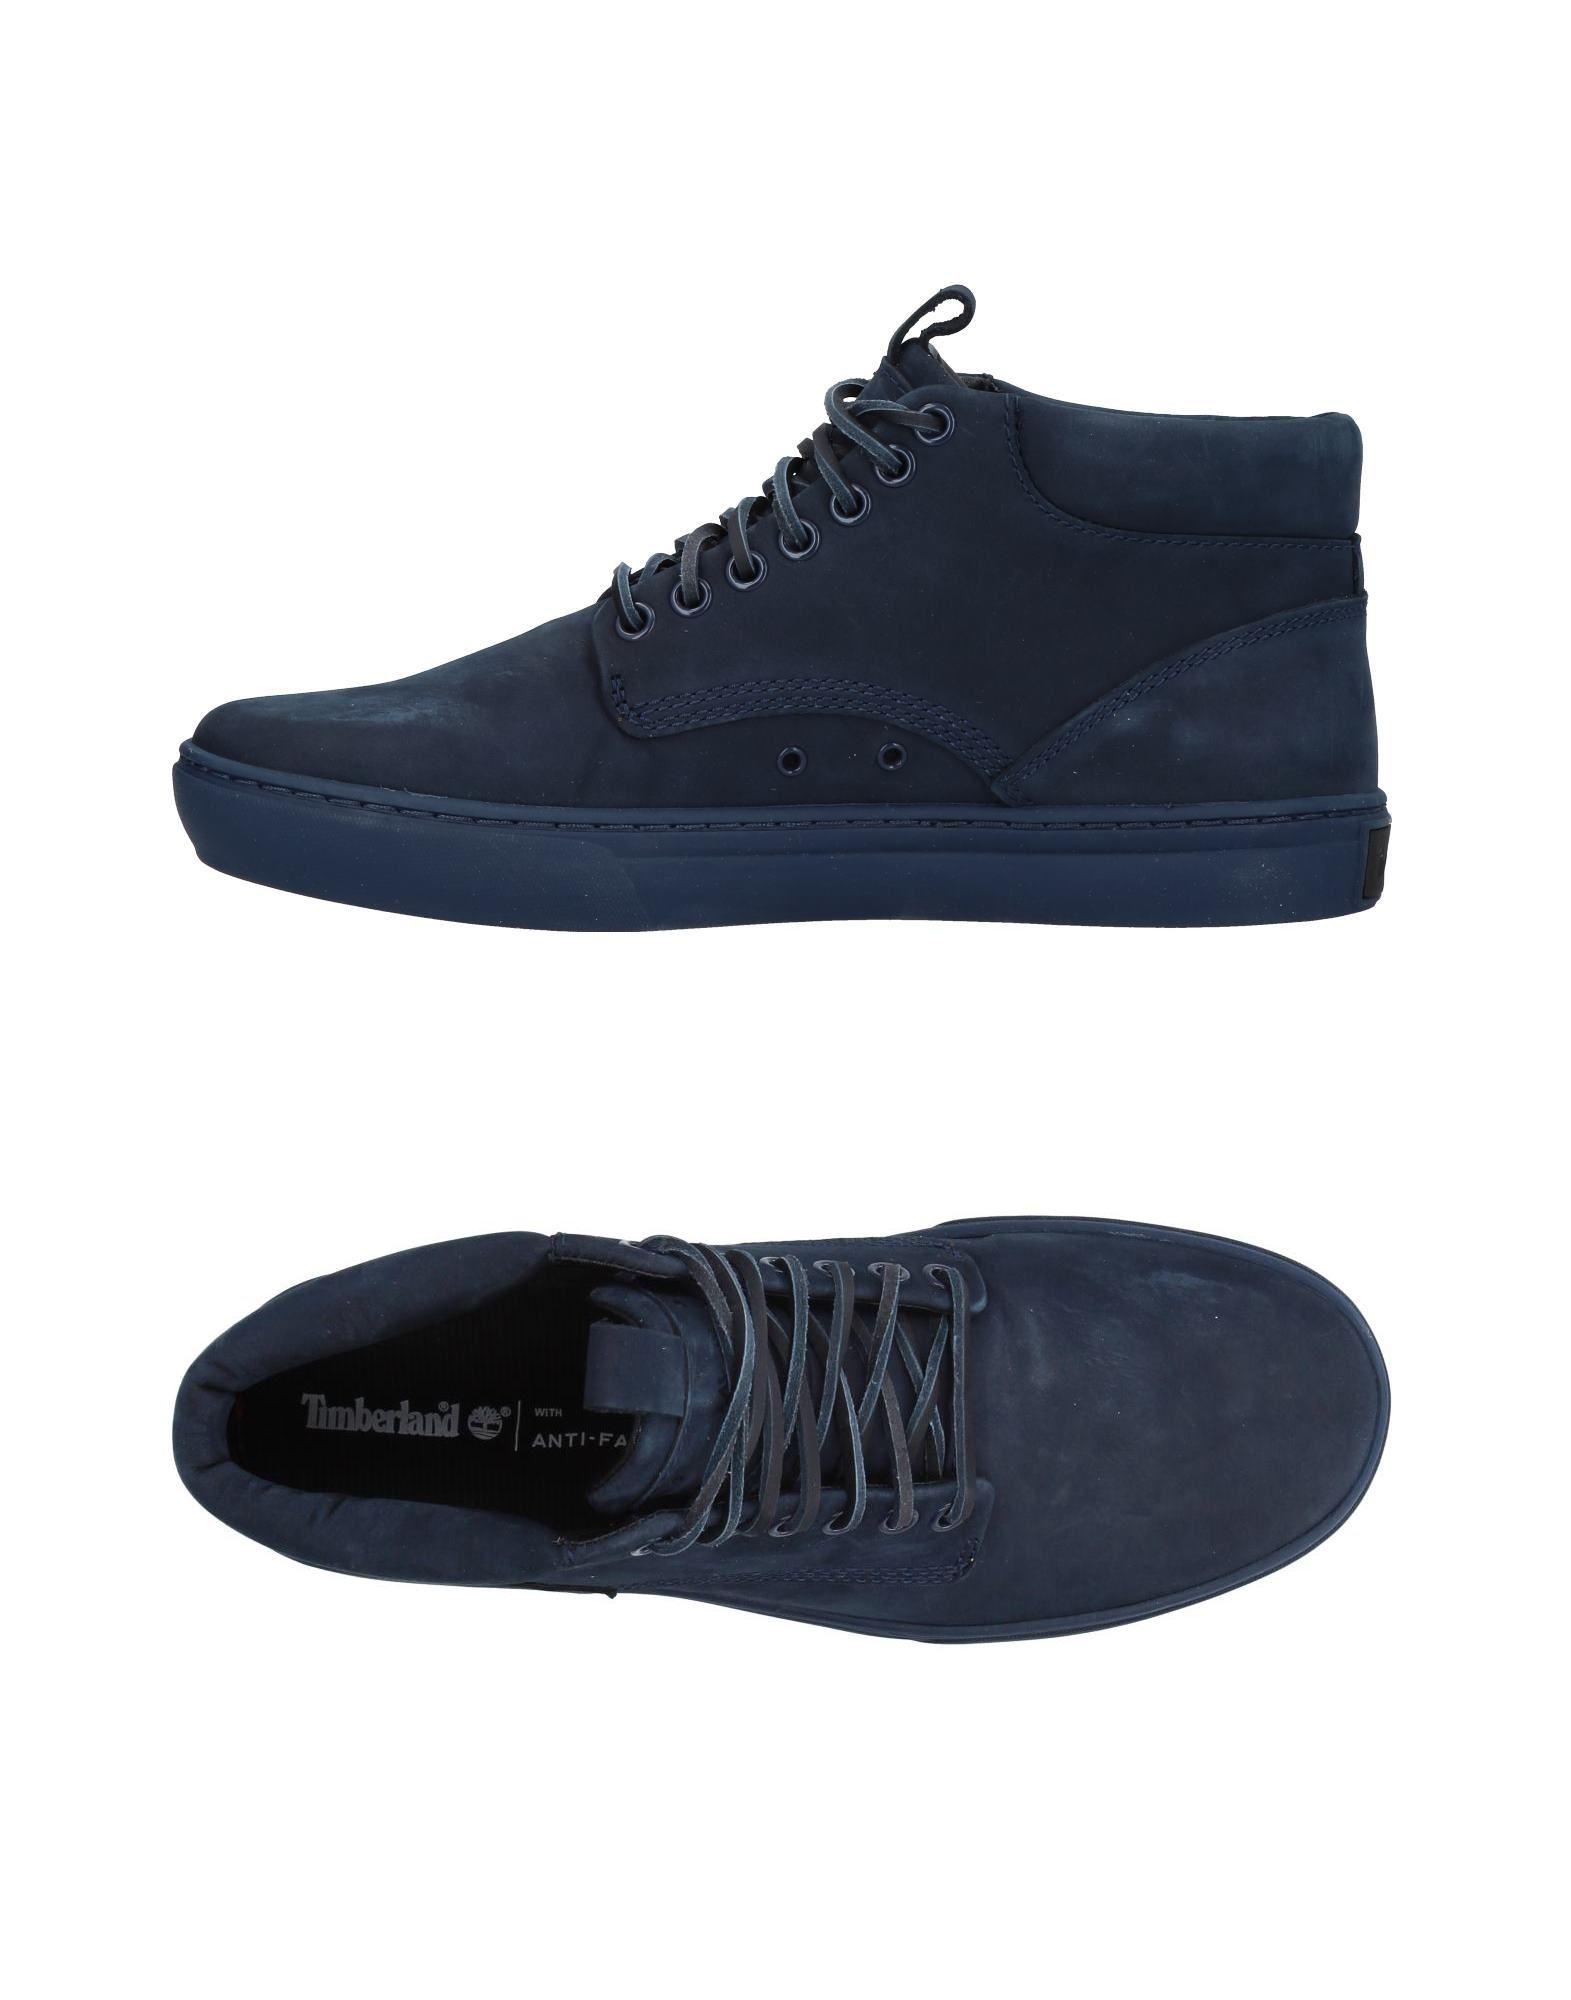 Sneakers Timberland Uomo - Acquista online su